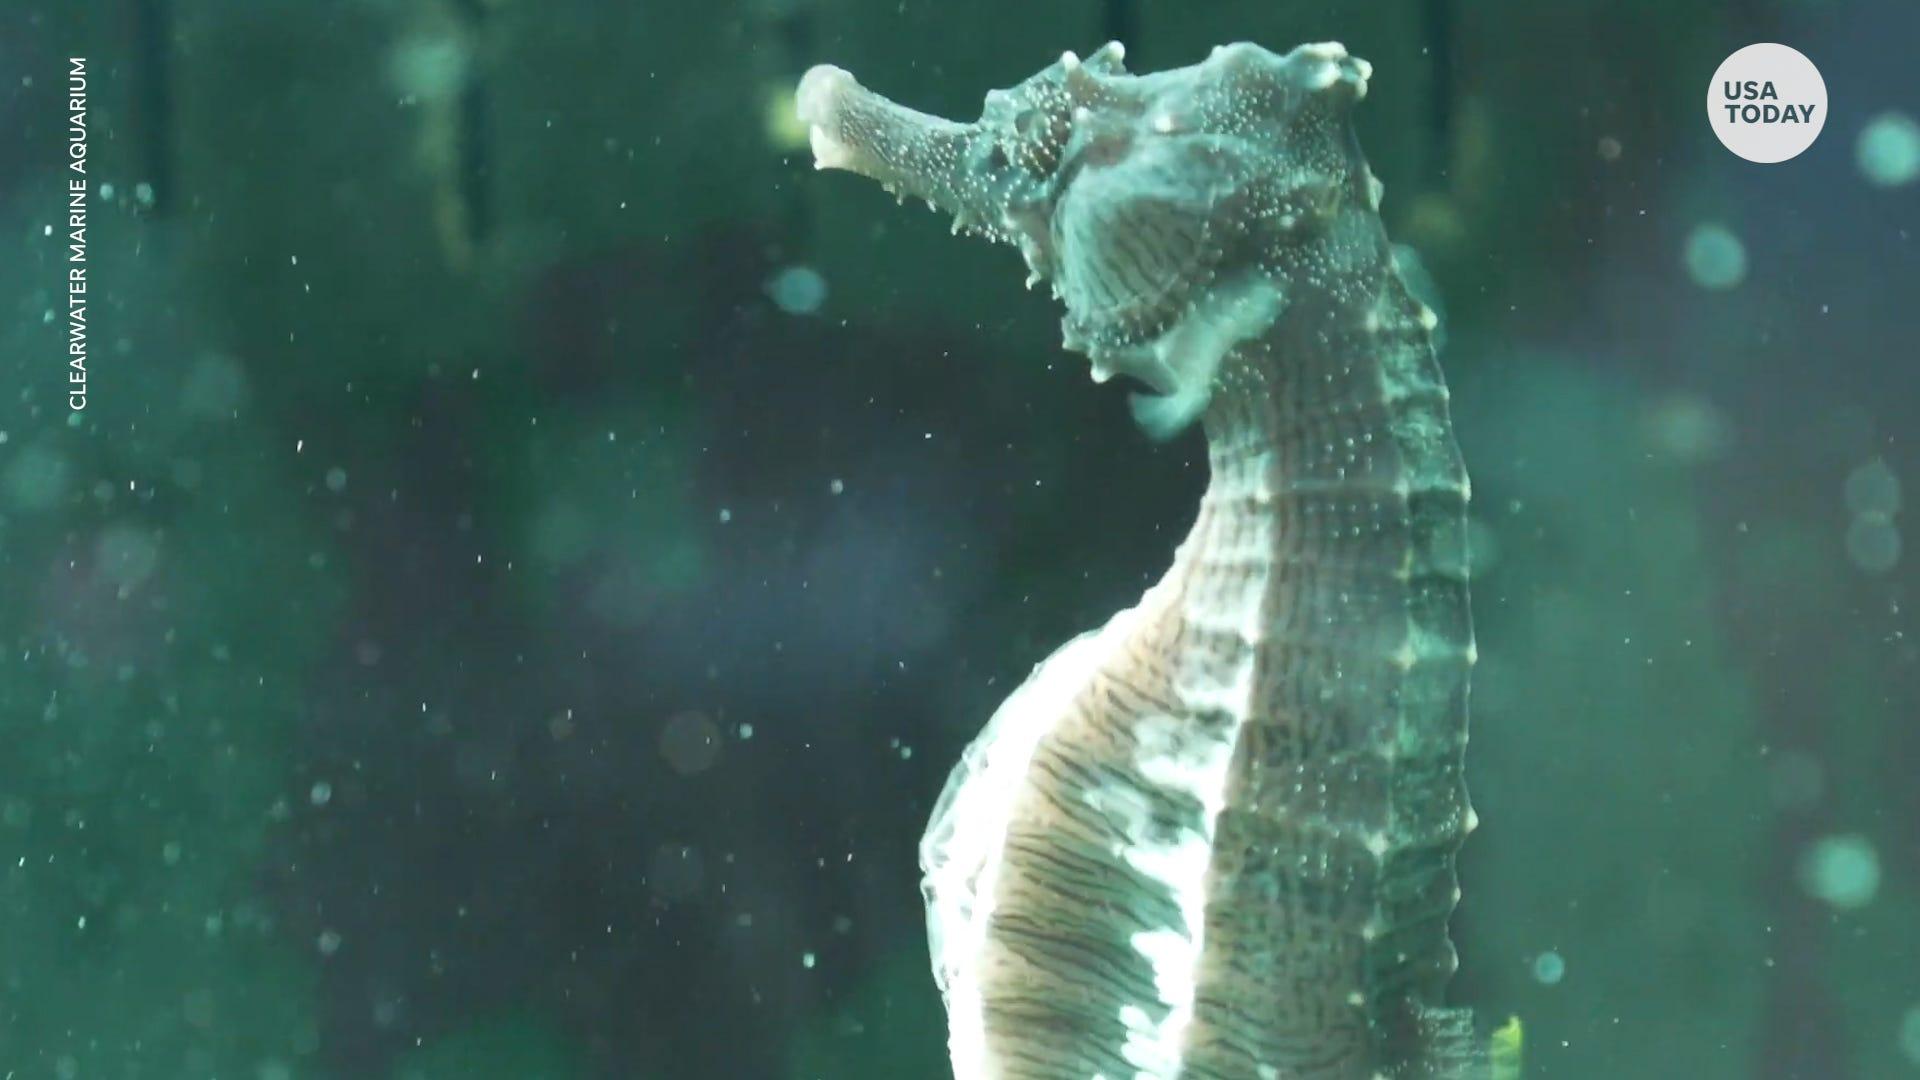 Rescued seahorse had quite the surprise for veterinarians